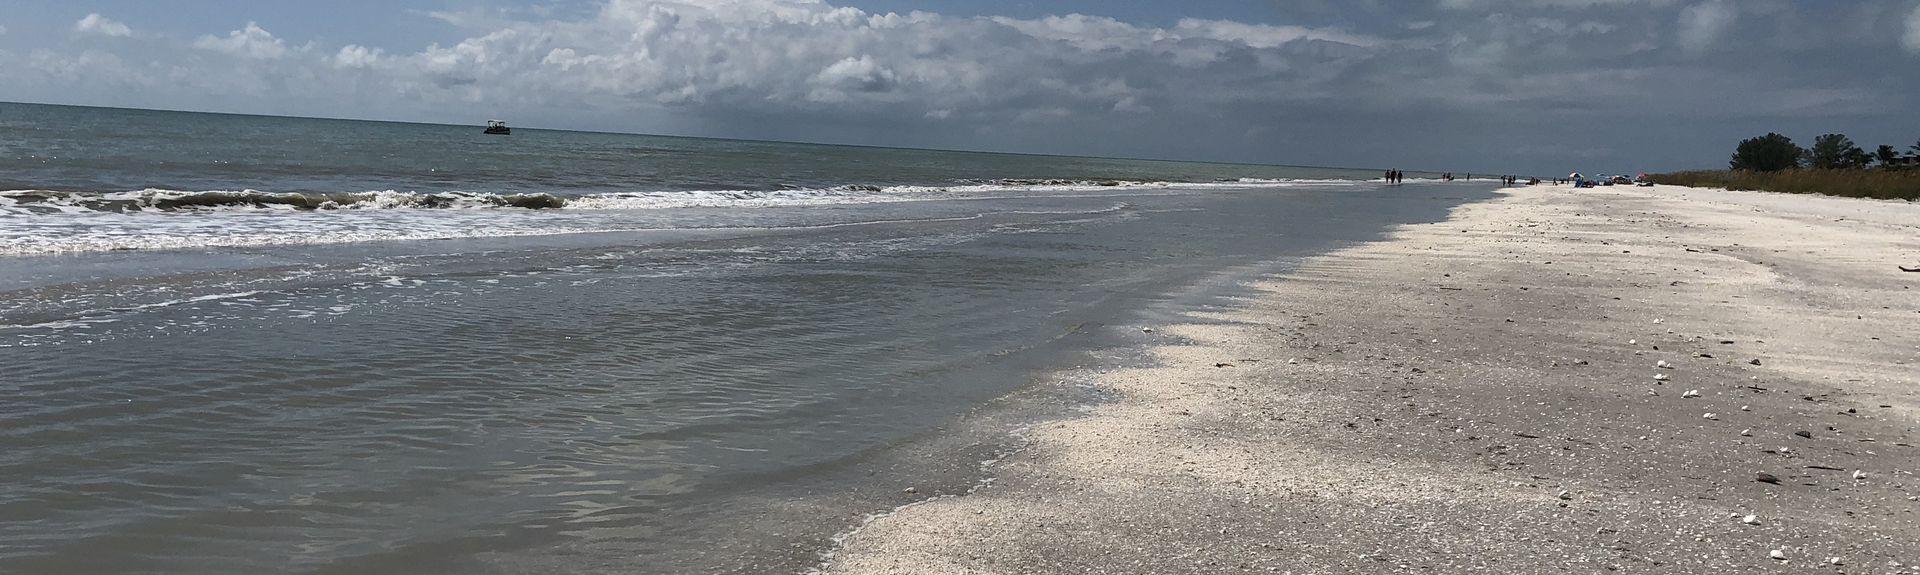 Sandpiper Beach Sanibel Vacation